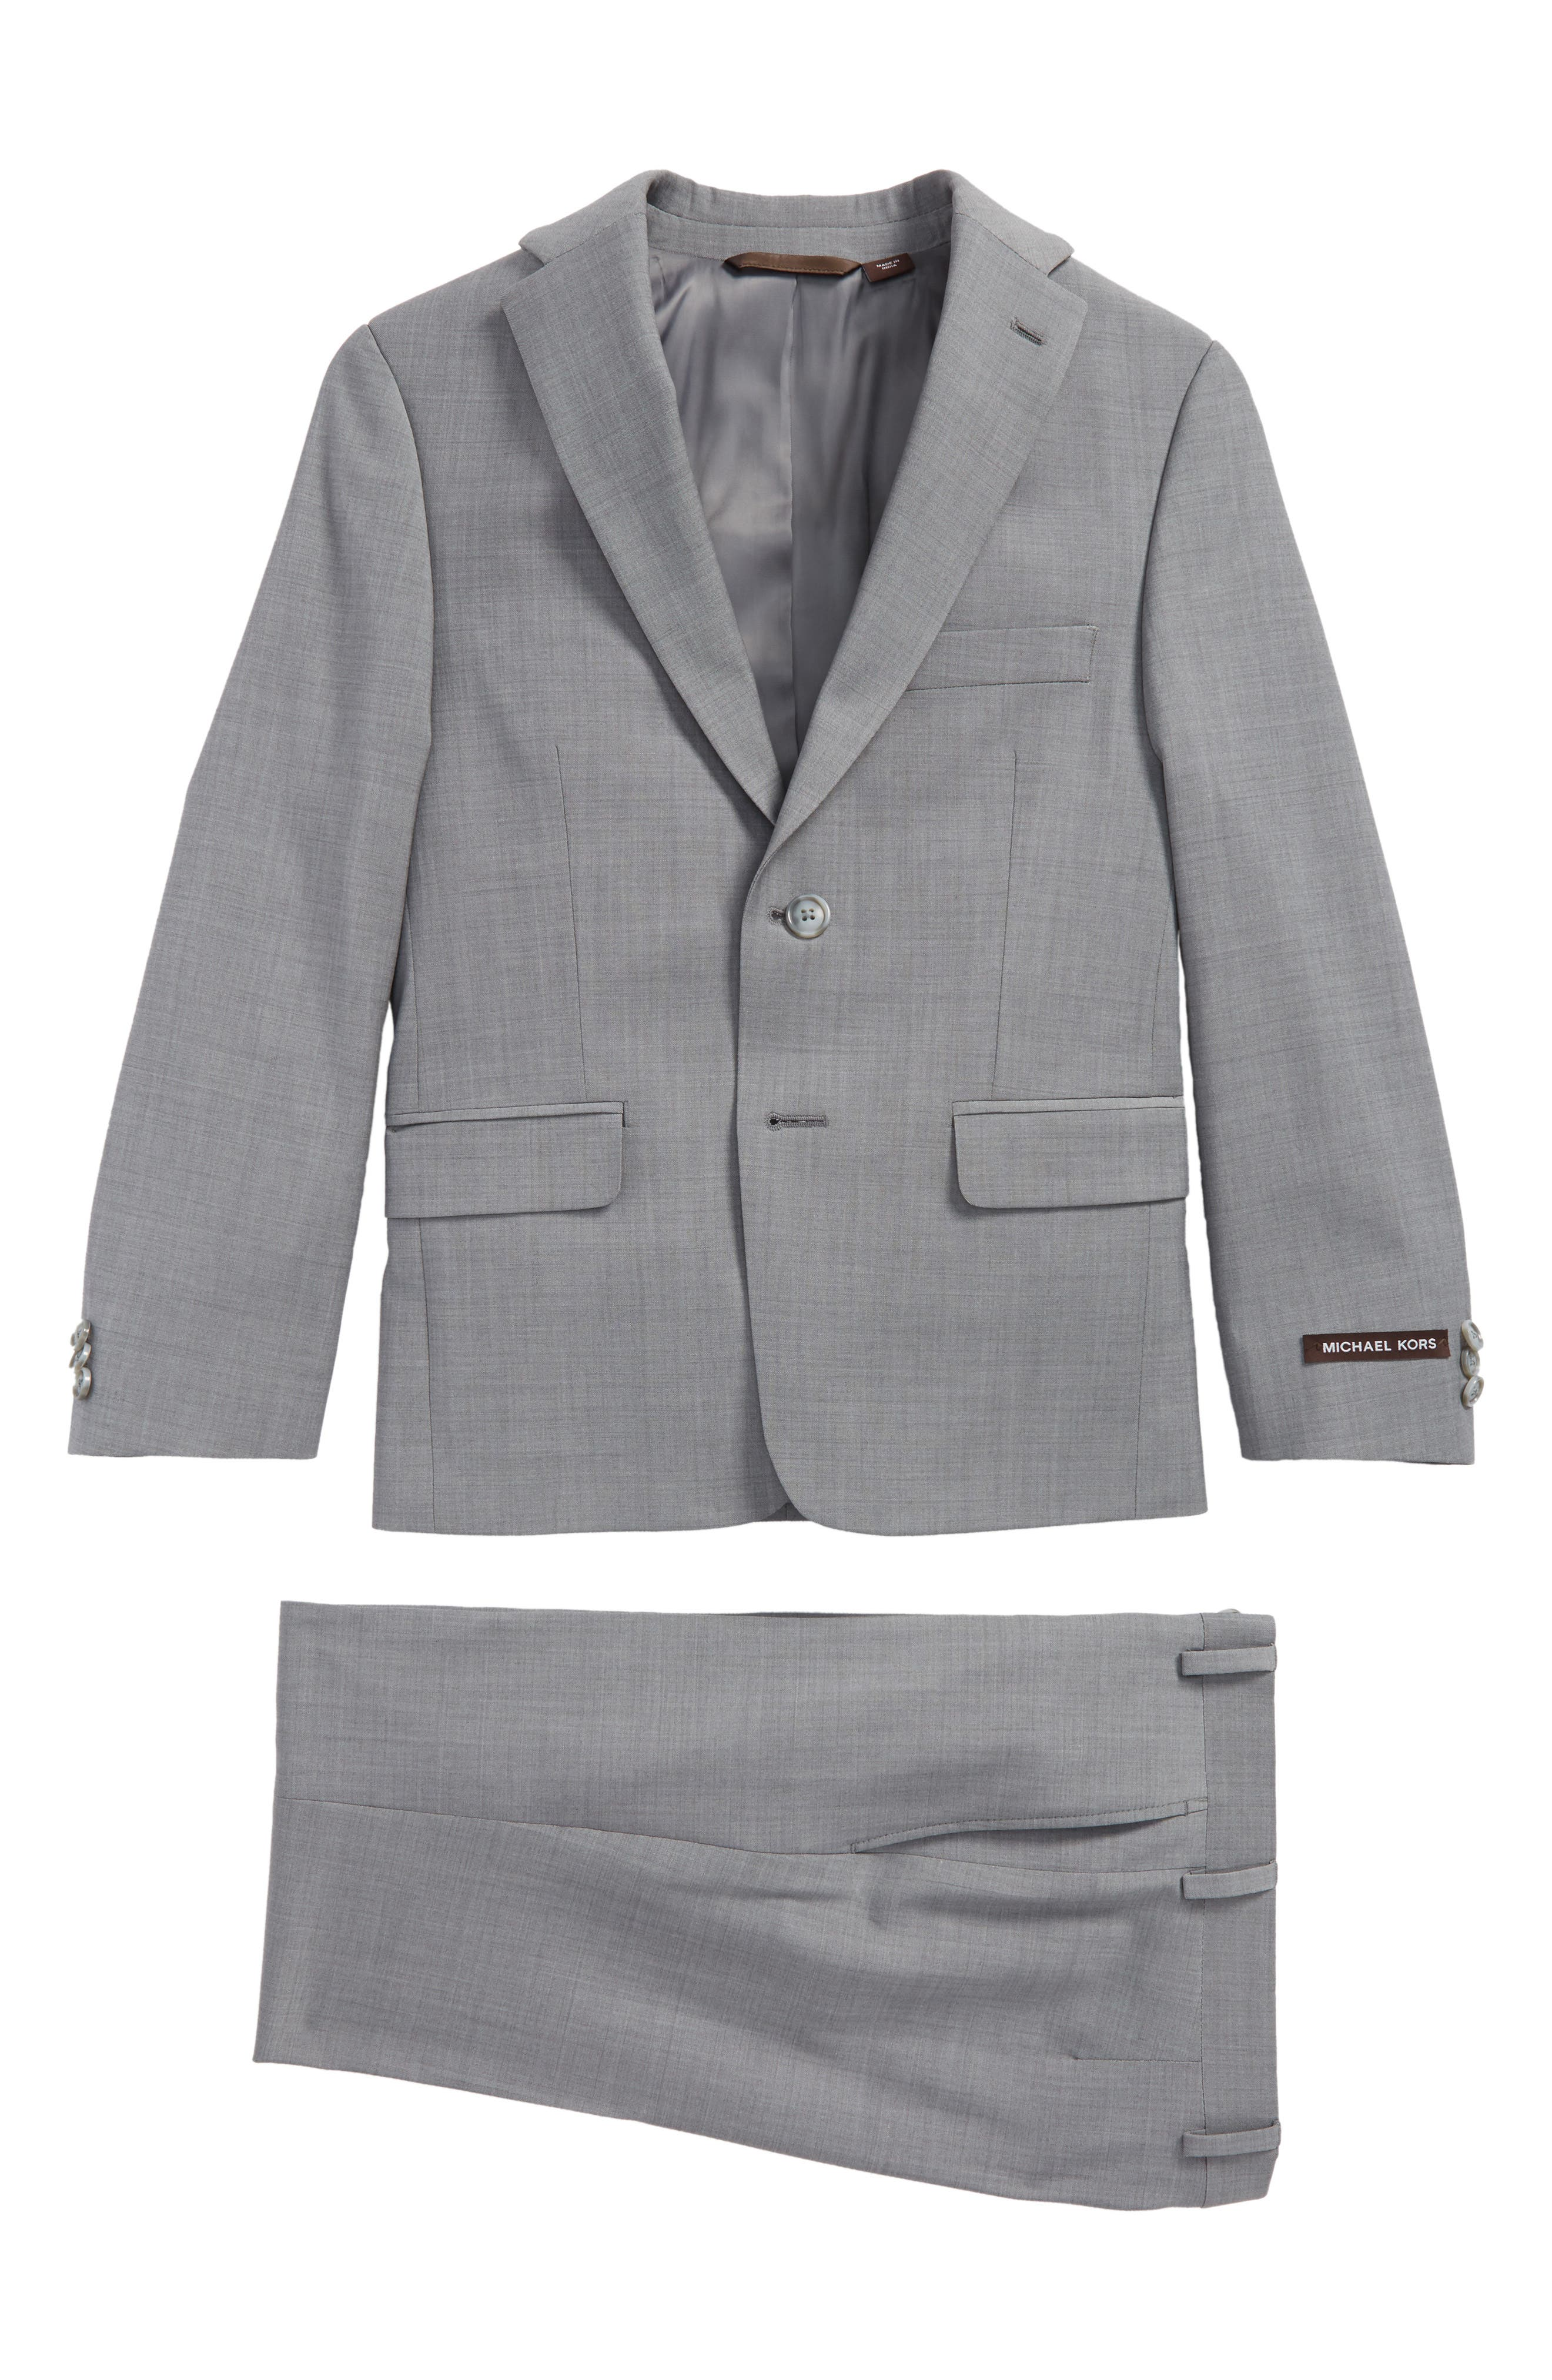 MICHAEL KORS, Stretch Wool Suit, Main thumbnail 1, color, LIGHT GREY